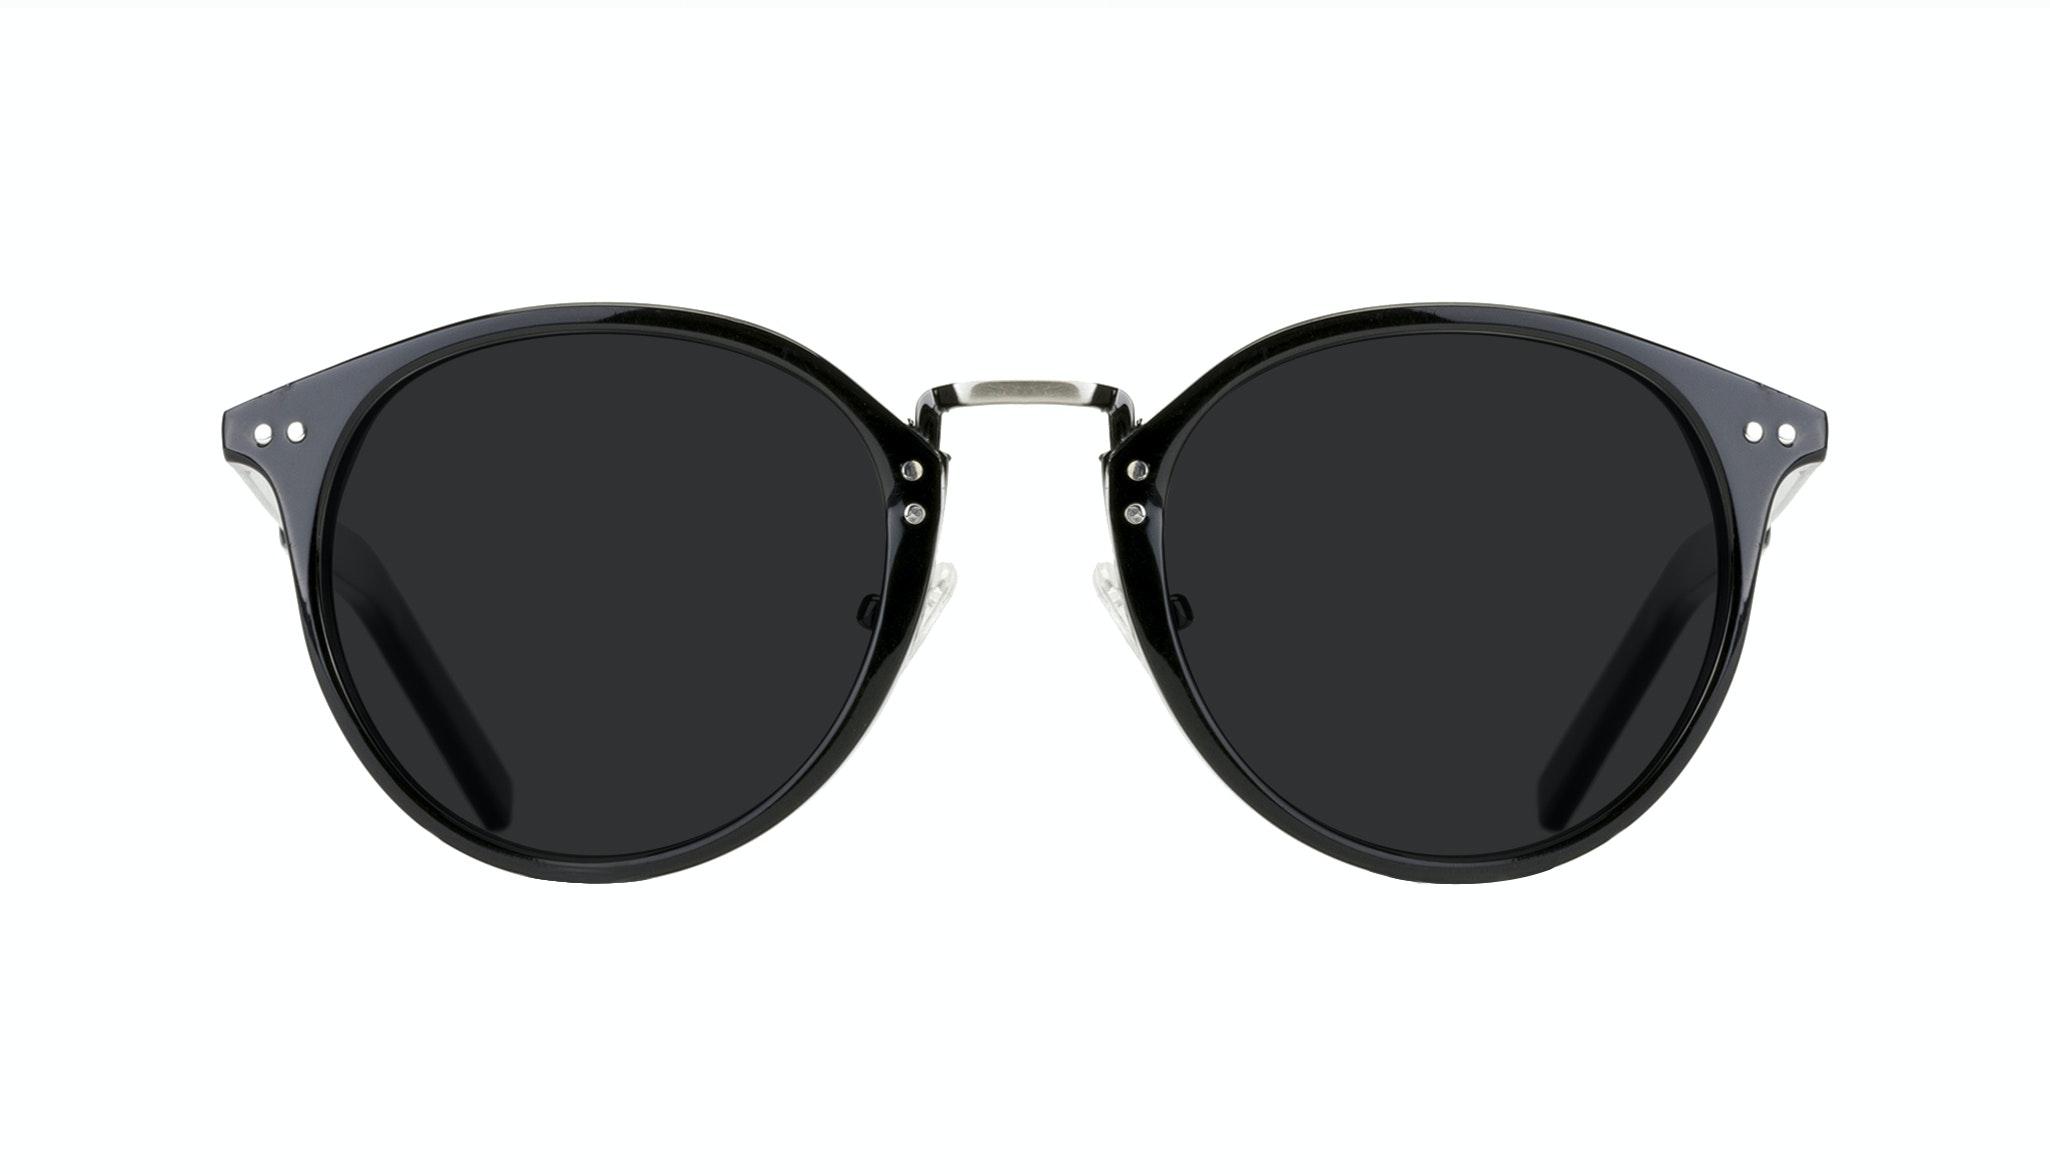 Affordable Fashion Glasses Round Sunglasses Men Truly Black